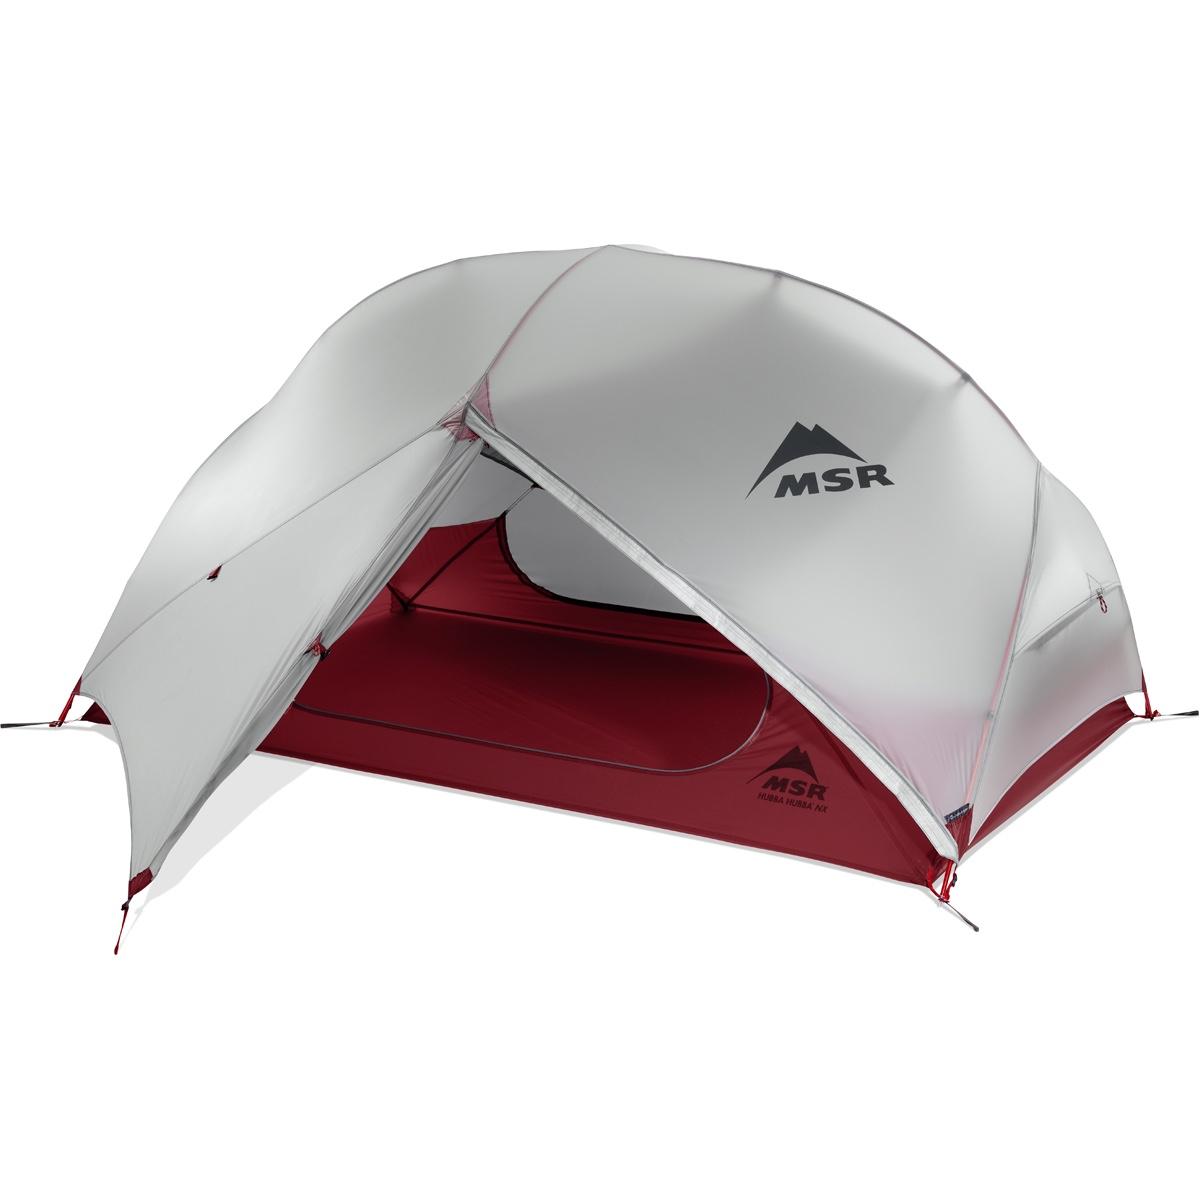 MSR Hubba Hubba NX - Tente 2 personnes 3 saisons